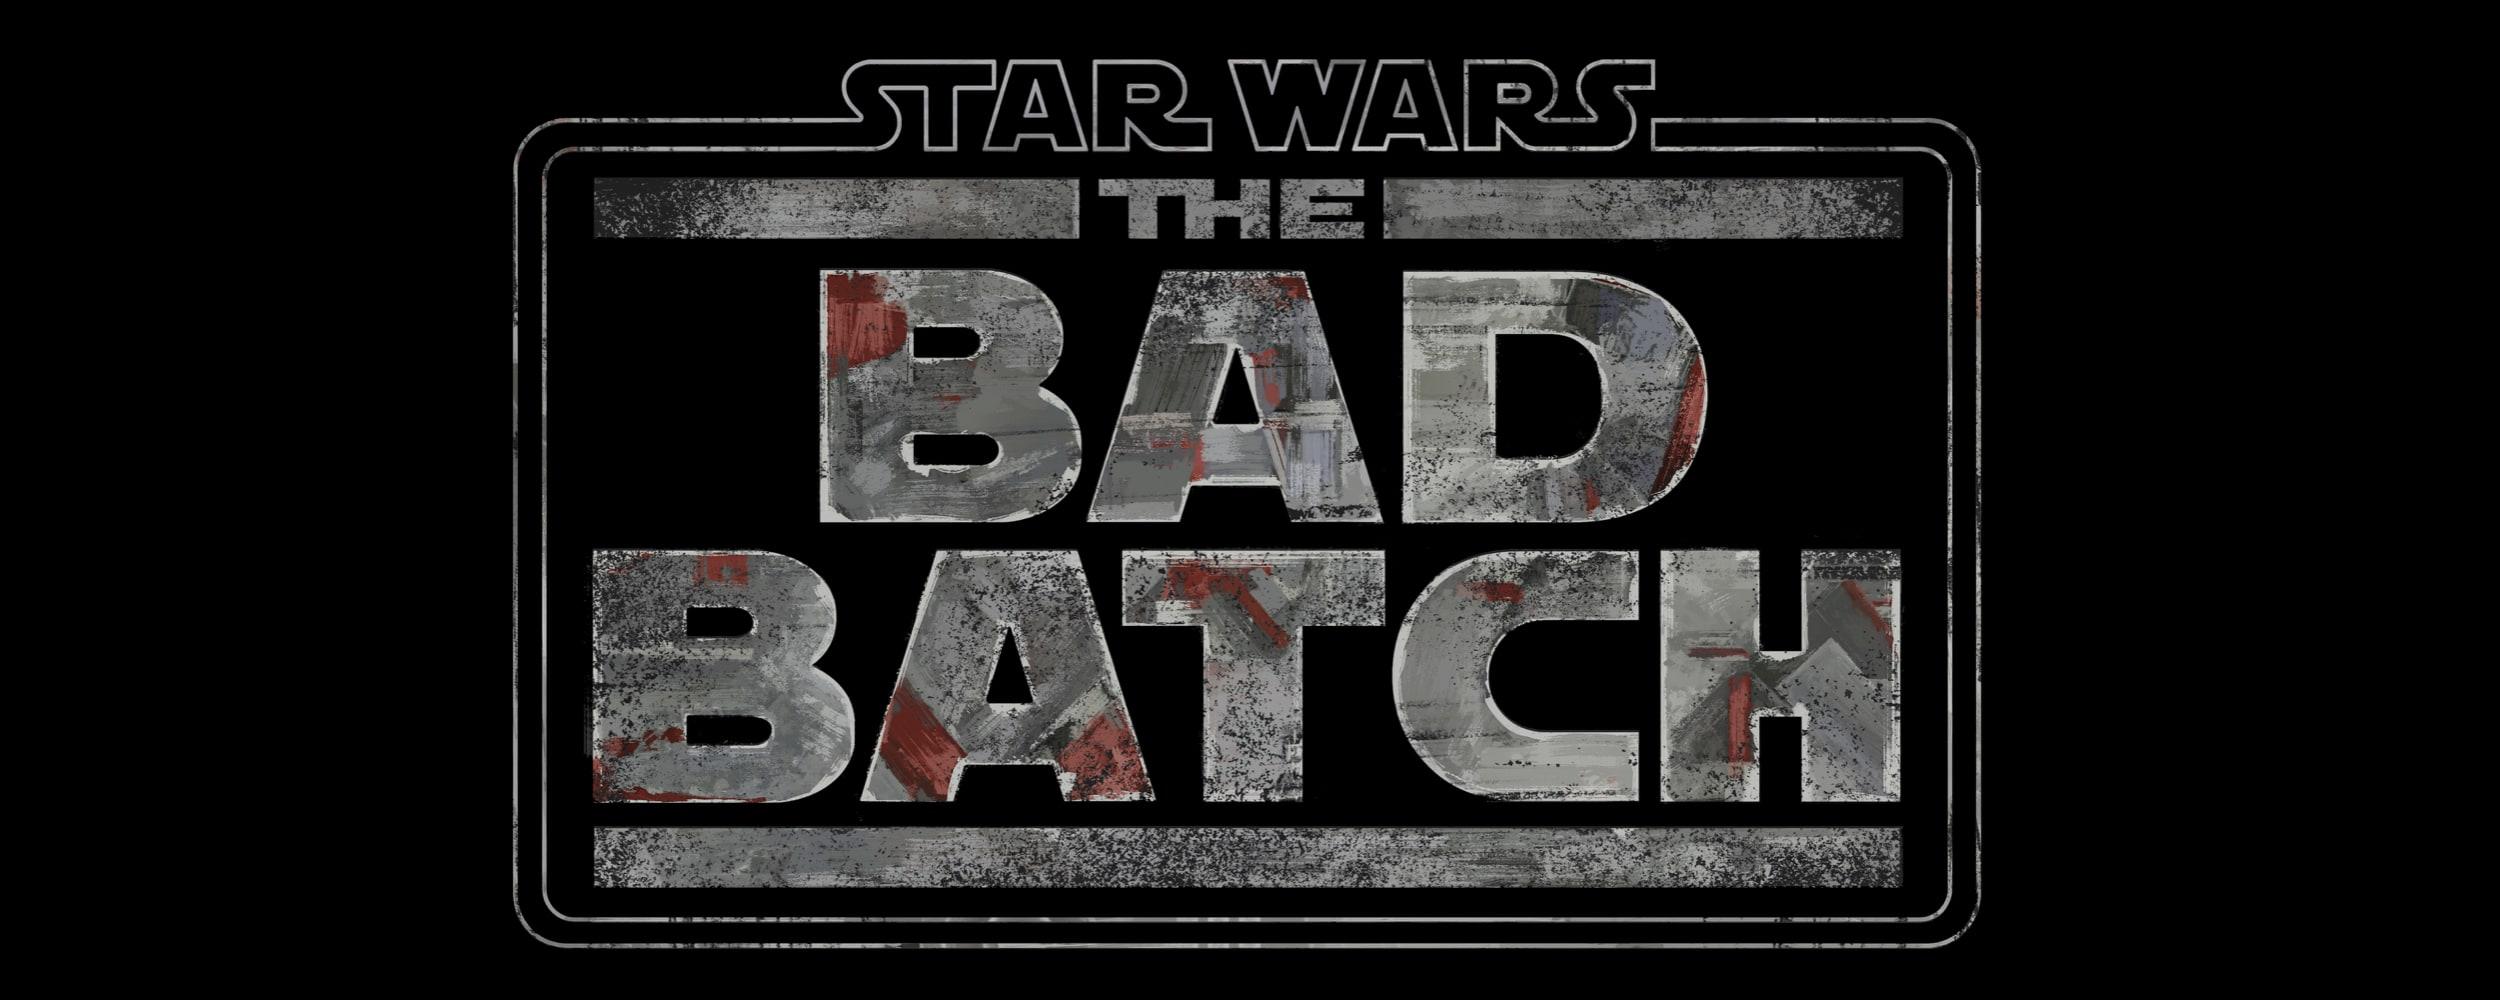 the_bad_batch star wars animated logo